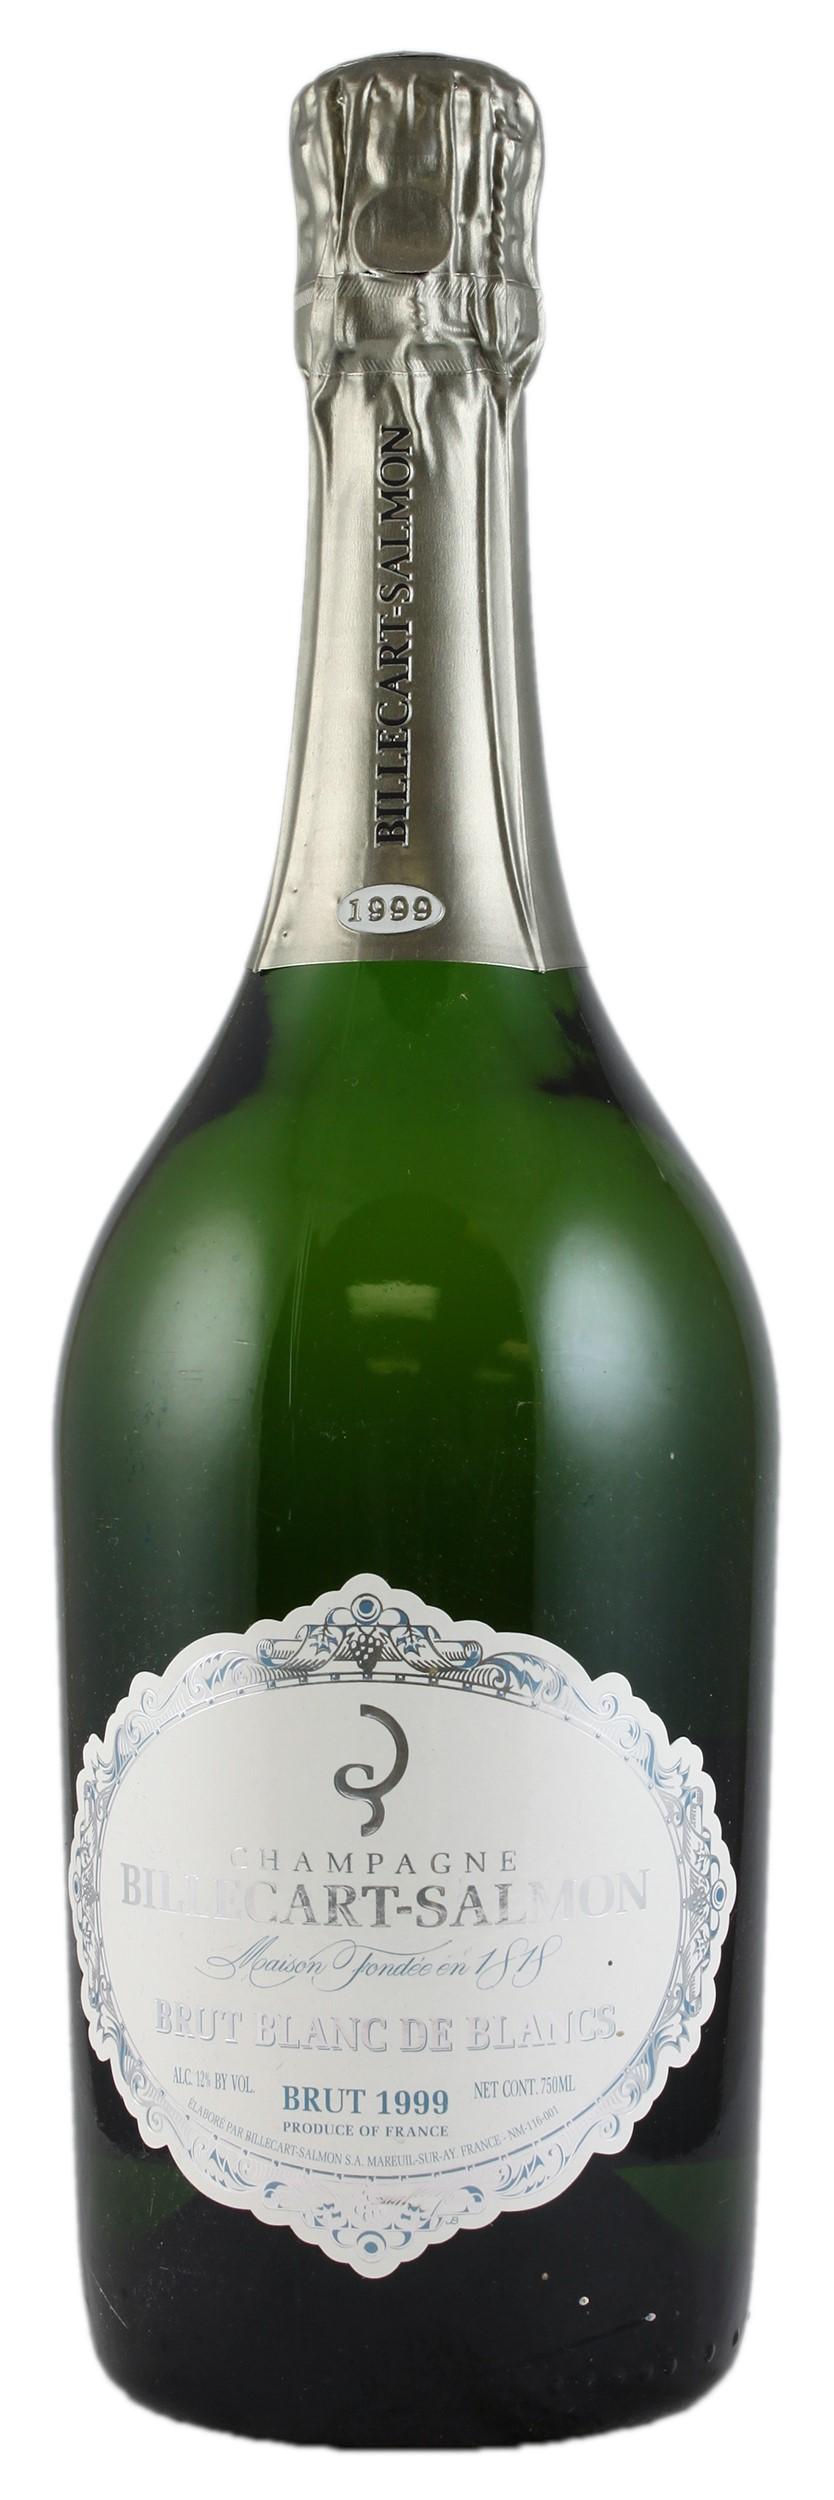 Billecart-Salmon Blanc de Blancs 1999, Sparkling from France - WineBid